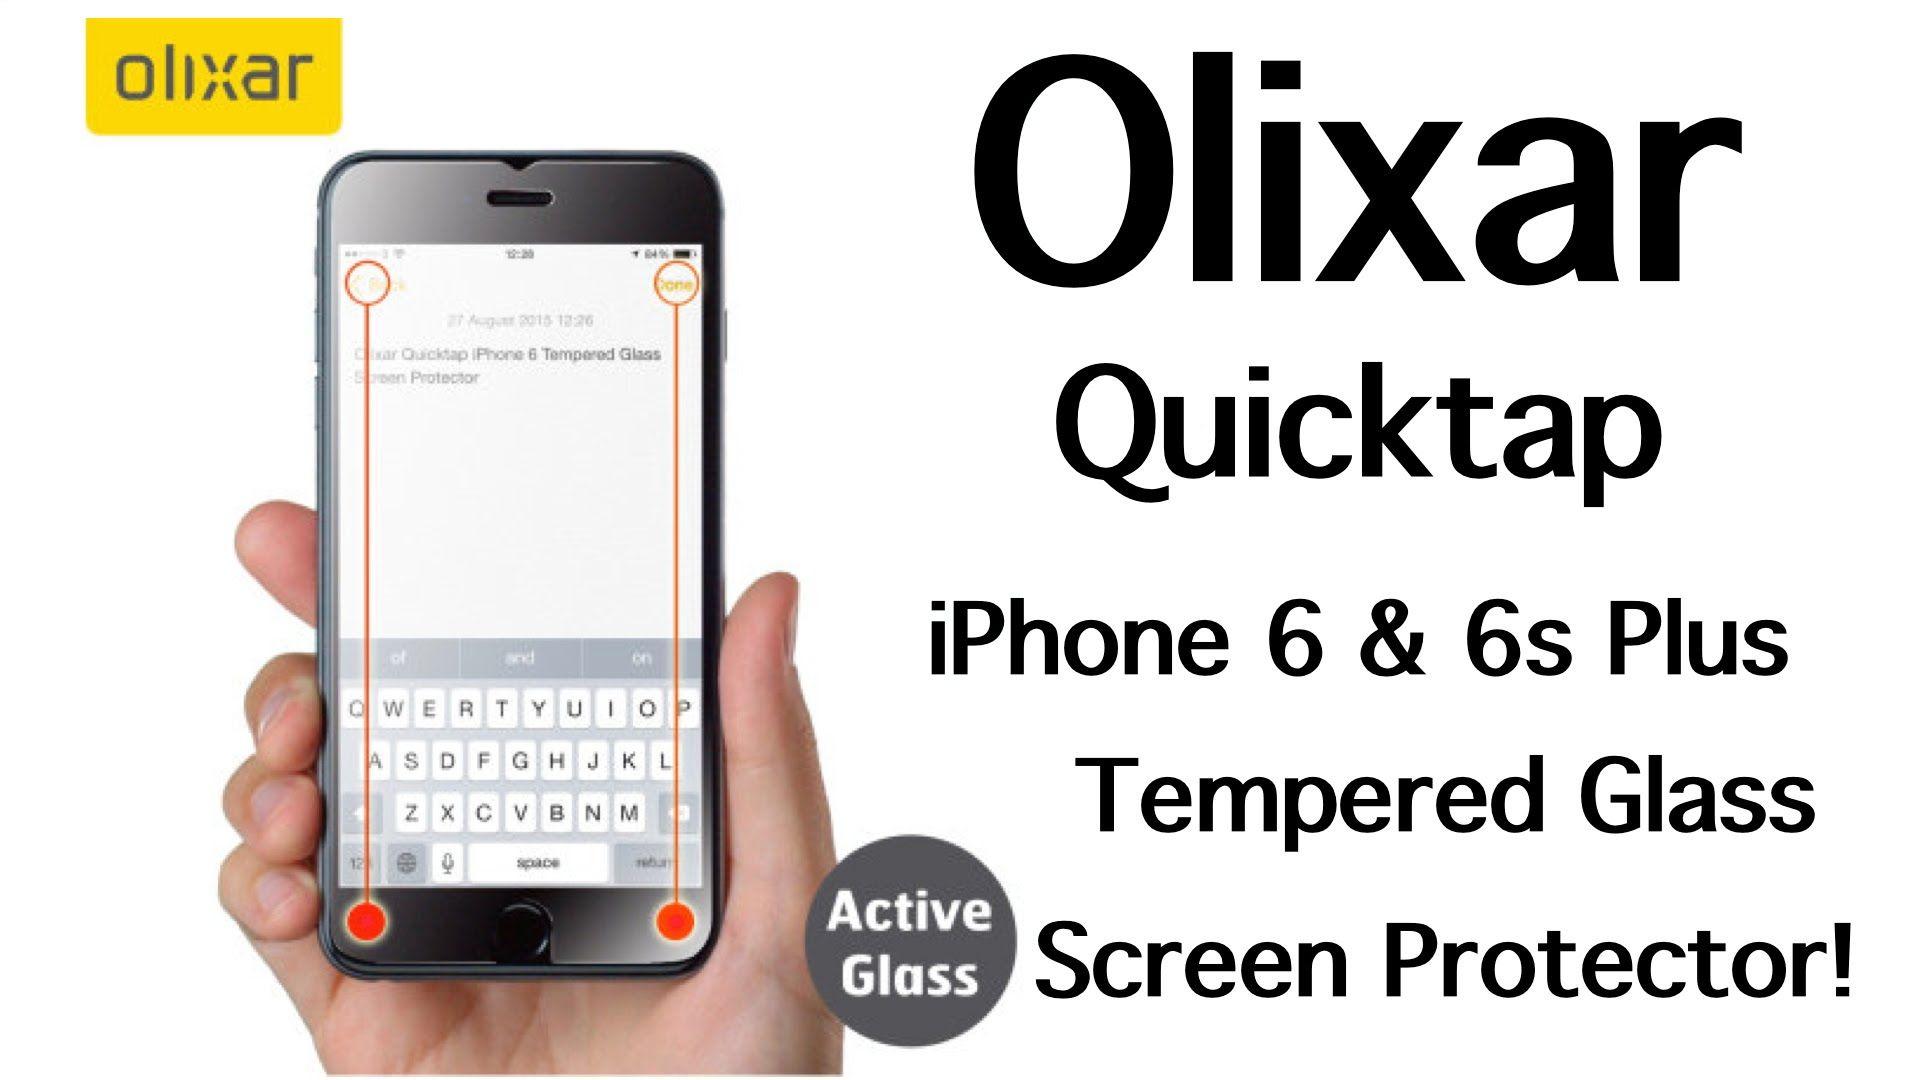 Olixar Quicktap iPhone 6 Plus 6s Plus Tempered Glass Screen Protector